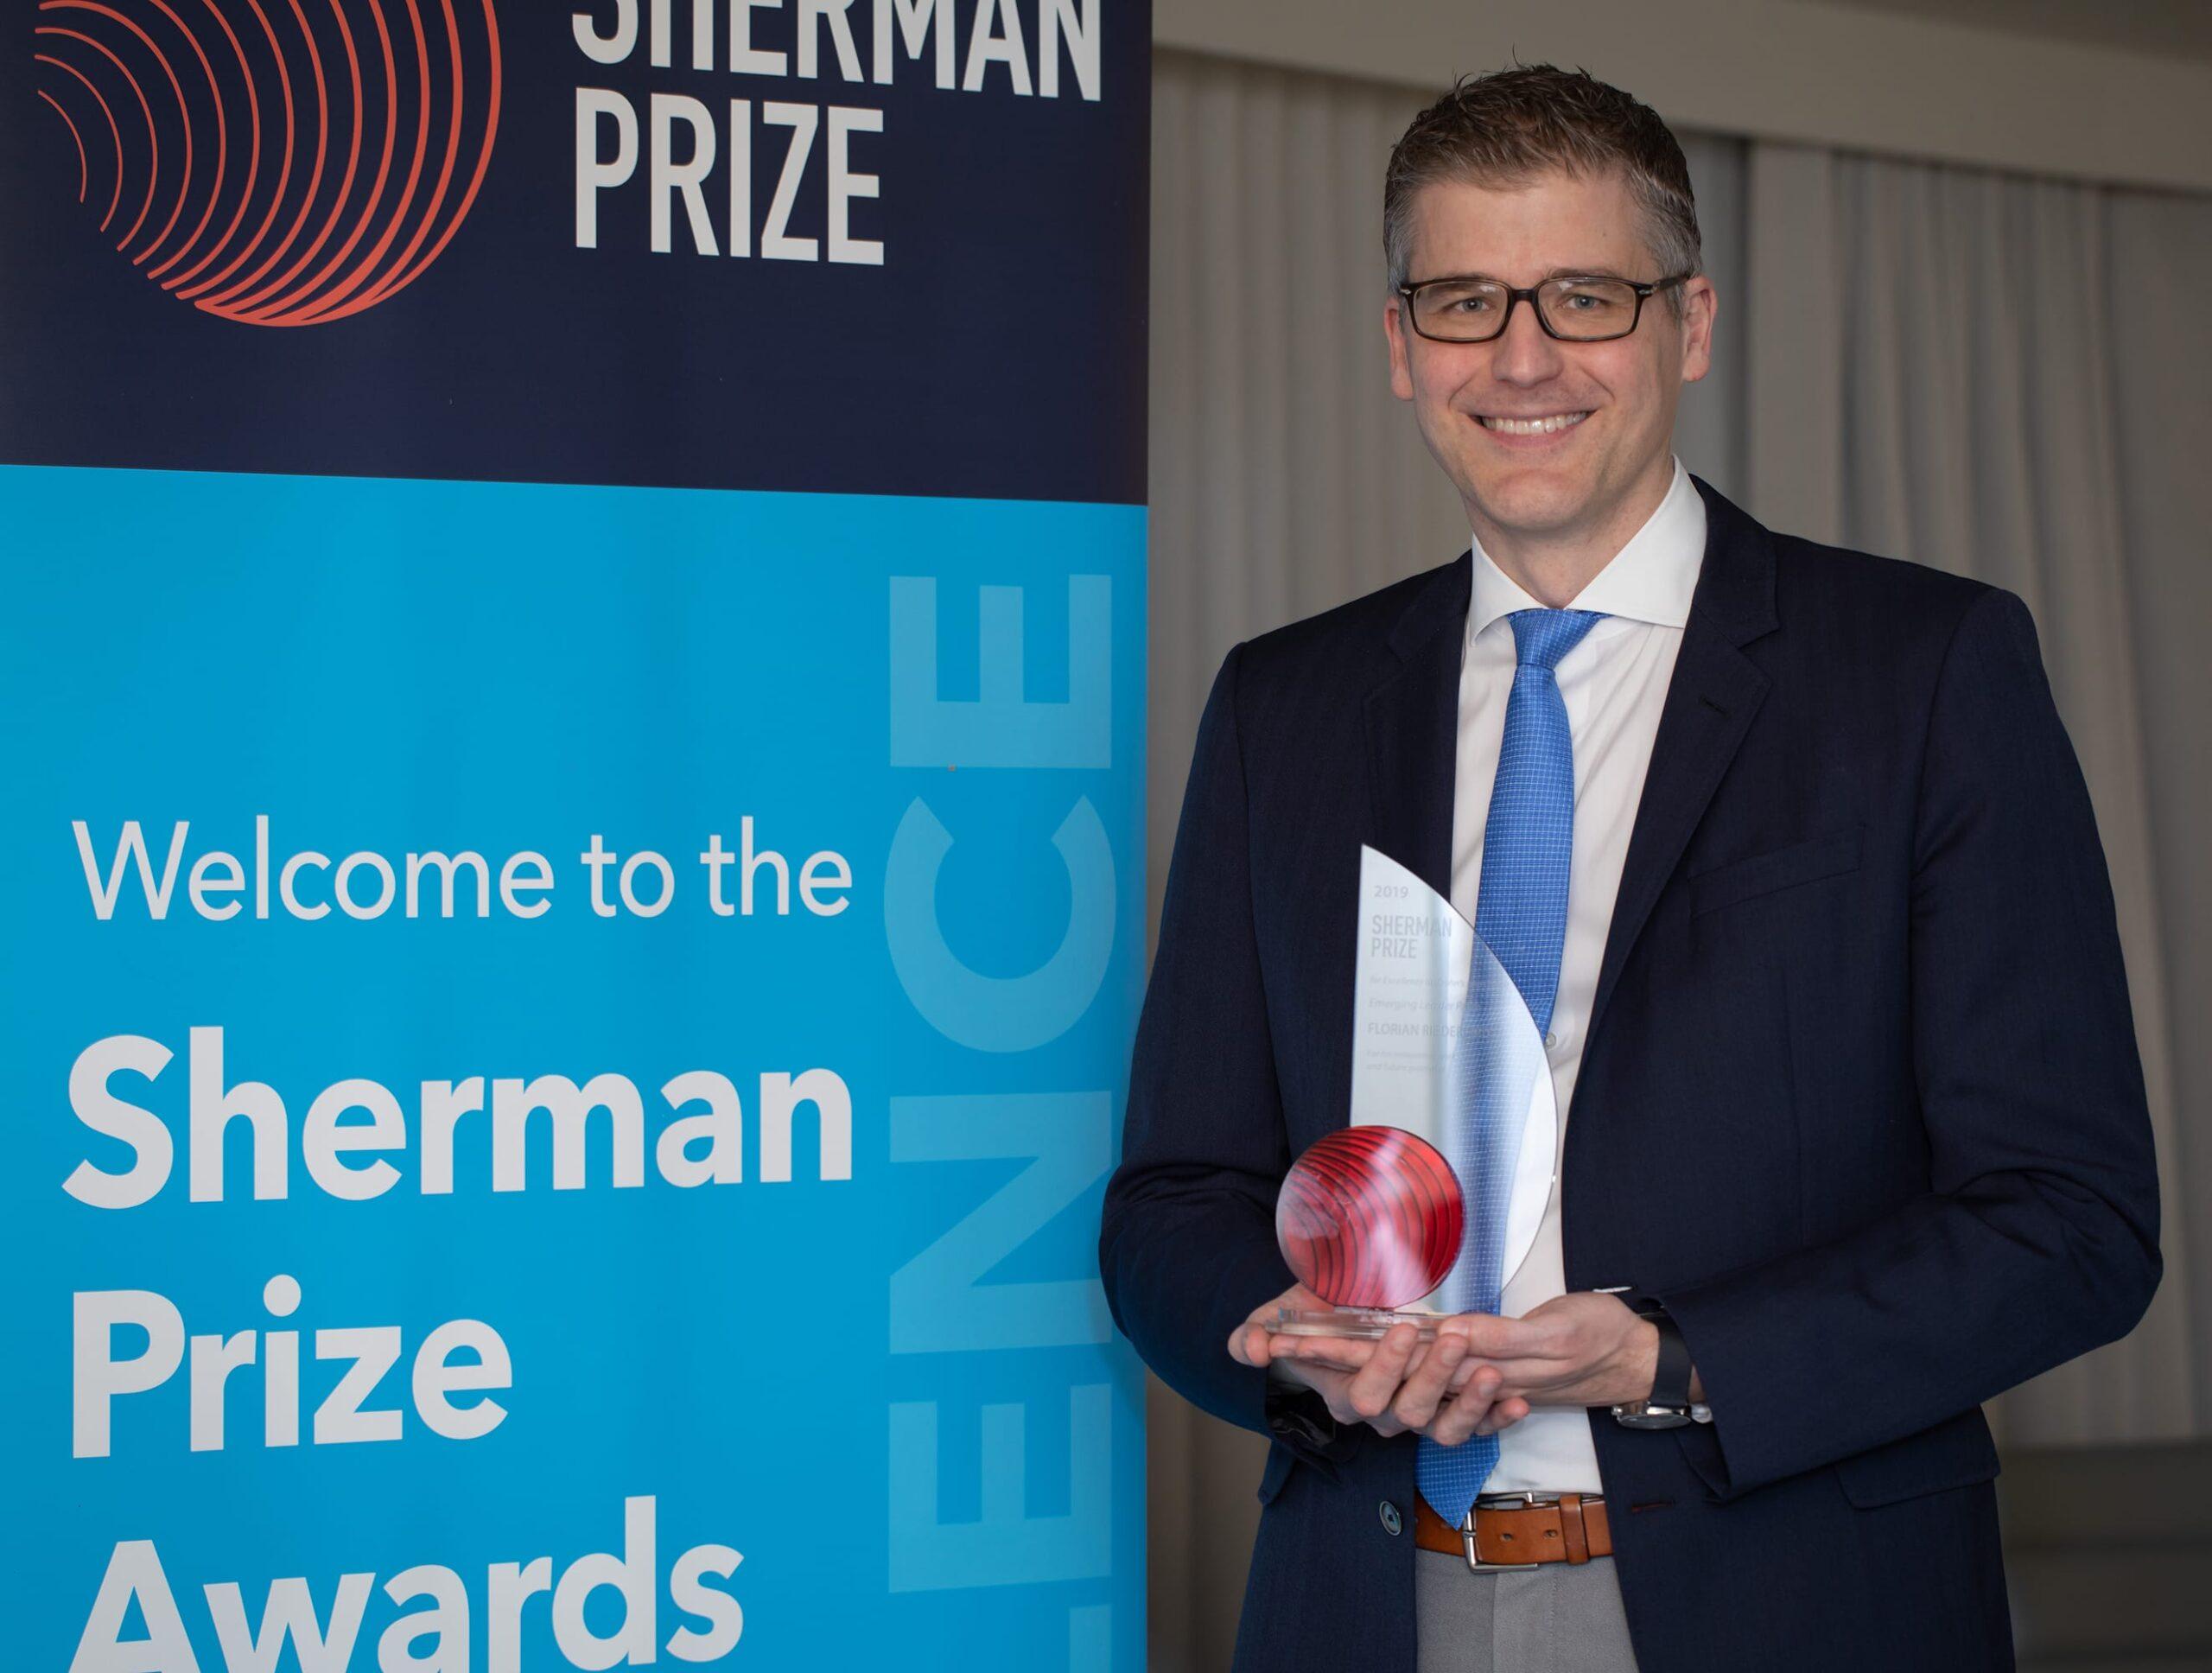 <p>2019 Sherman Emerging Leader Prize Recipient: Dr. Florian Rieder</p>